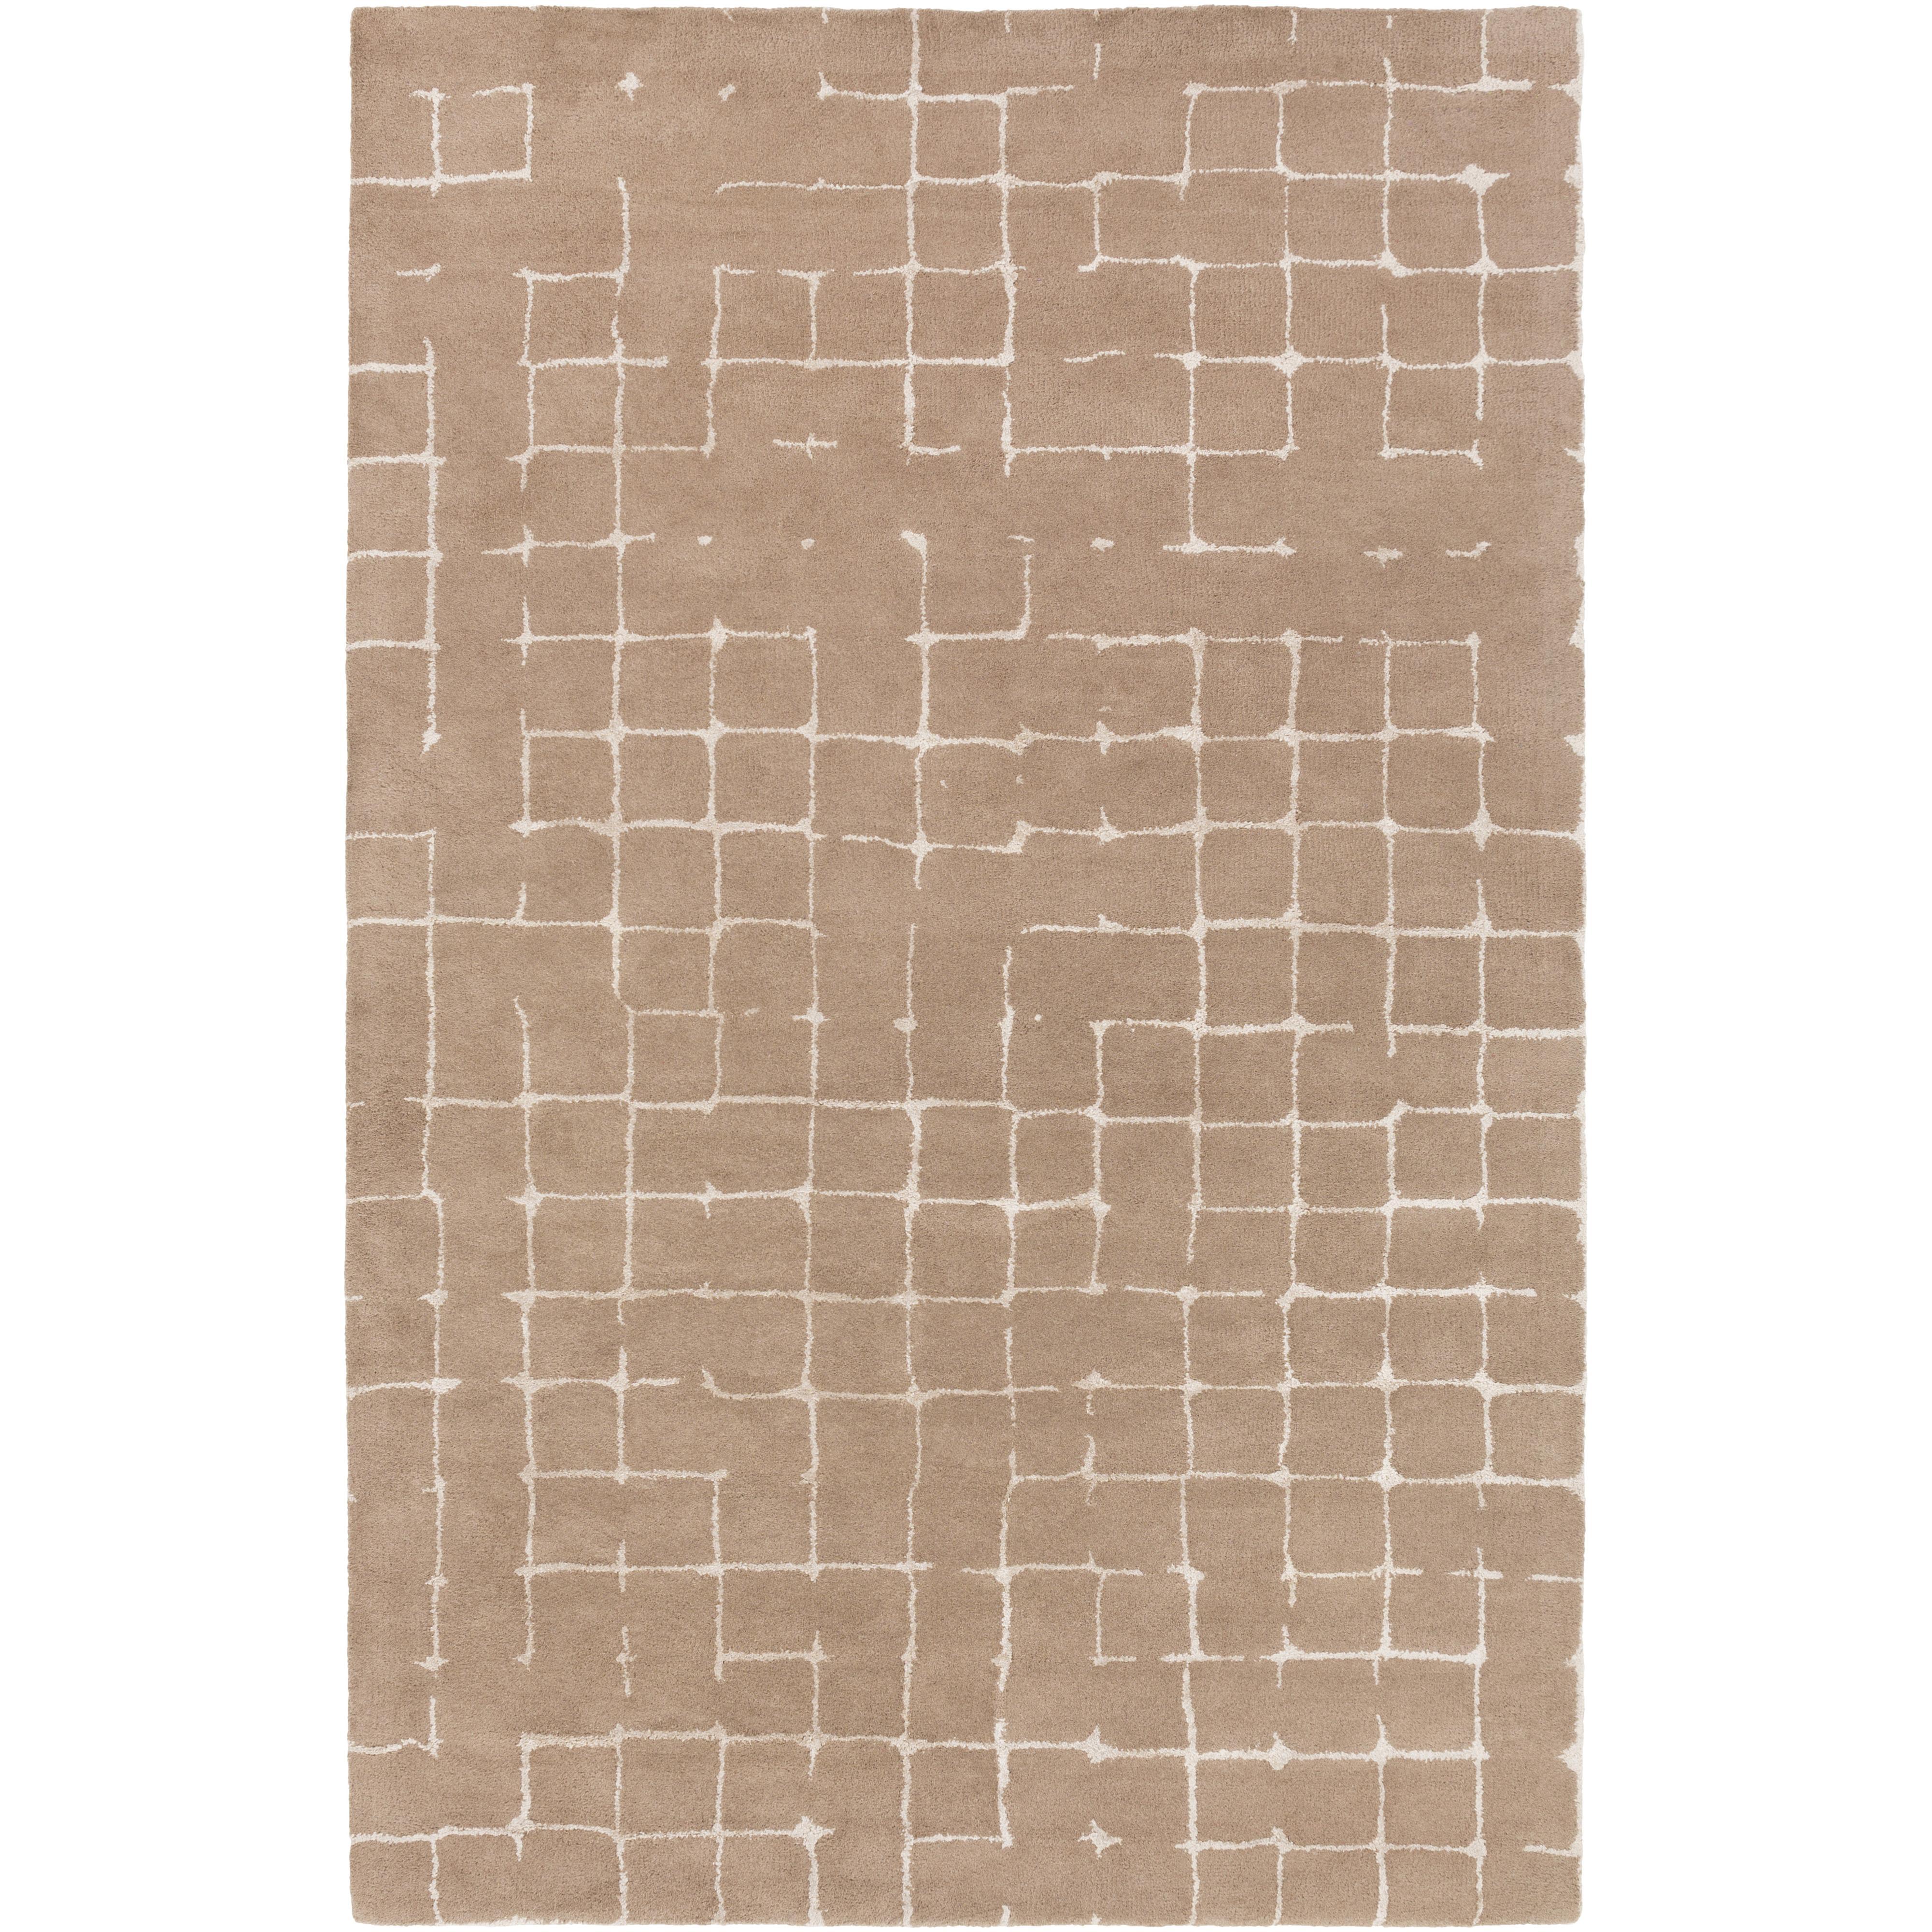 Surya Rugs Pursuit 8' x 11' - Item Number: PUT6001-811